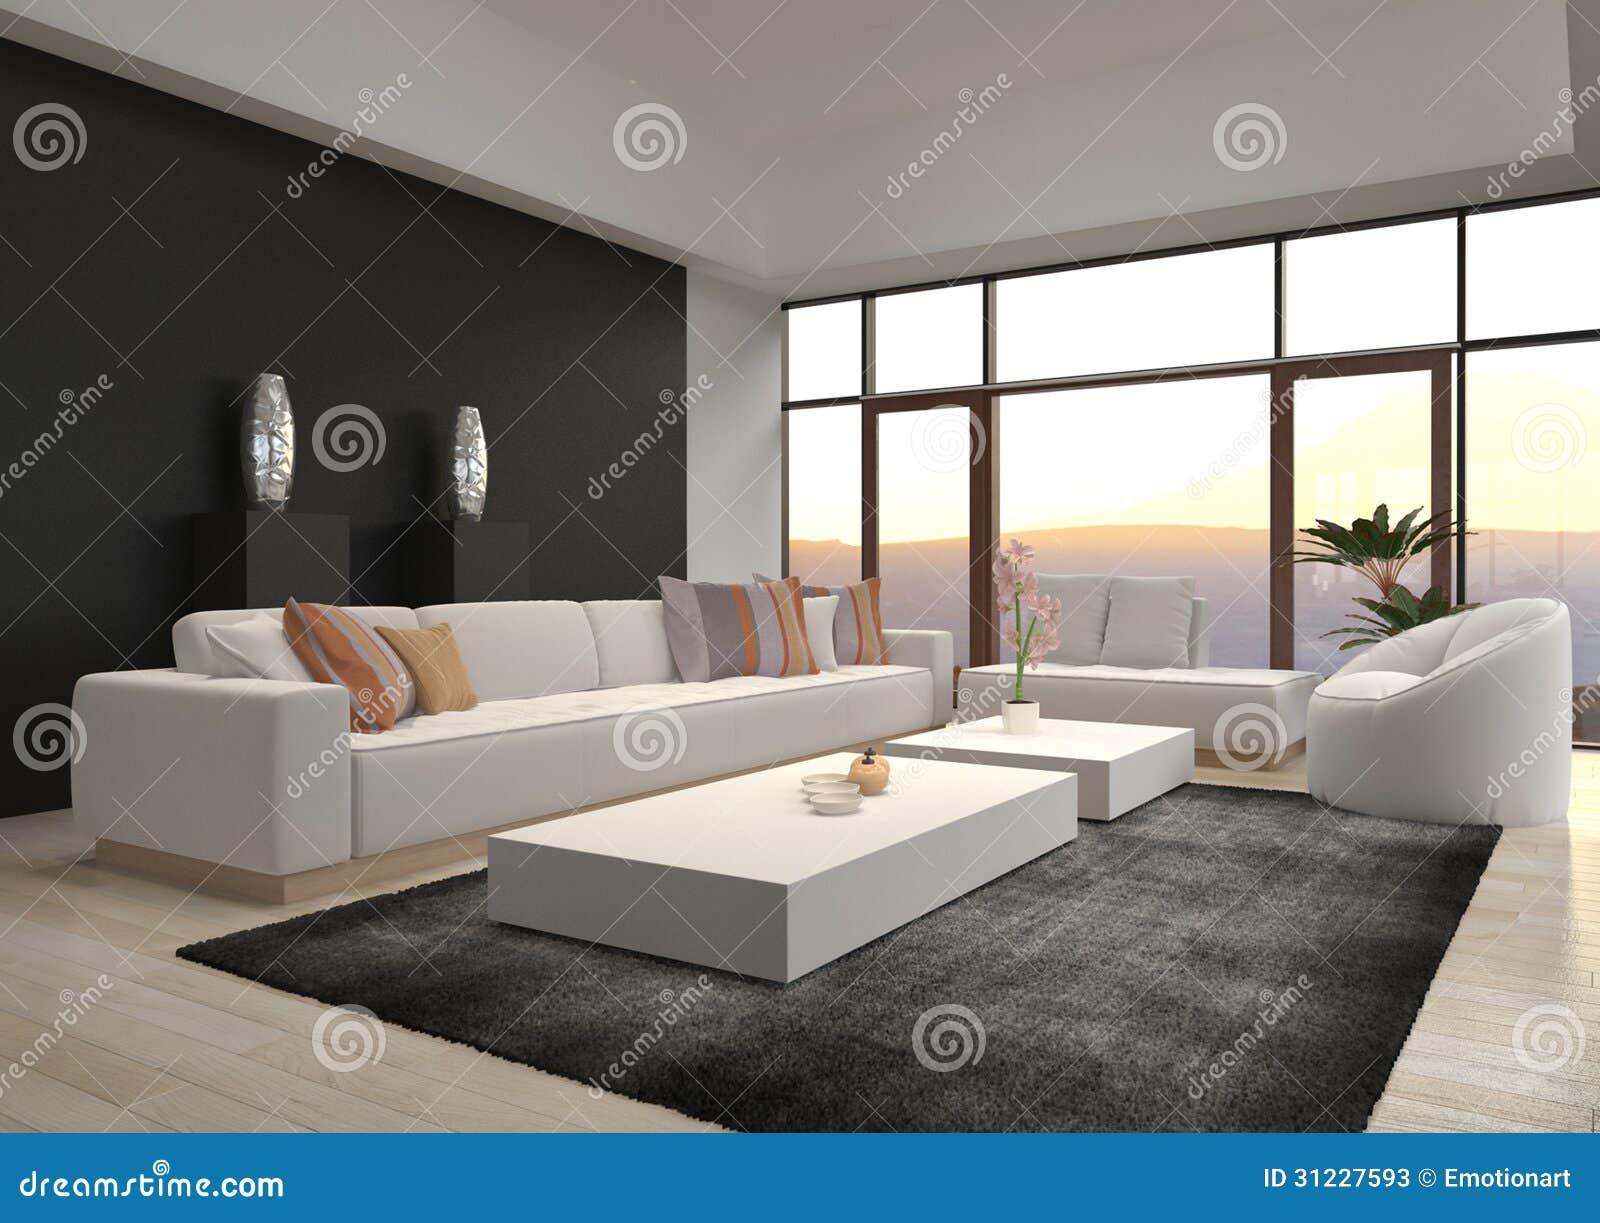 Villa Moderne 3d To Download Villa Moderne 3d Just Right Click And  #82A328 1300 1011 Progettare Cucina 3d Online Gratis Italiano